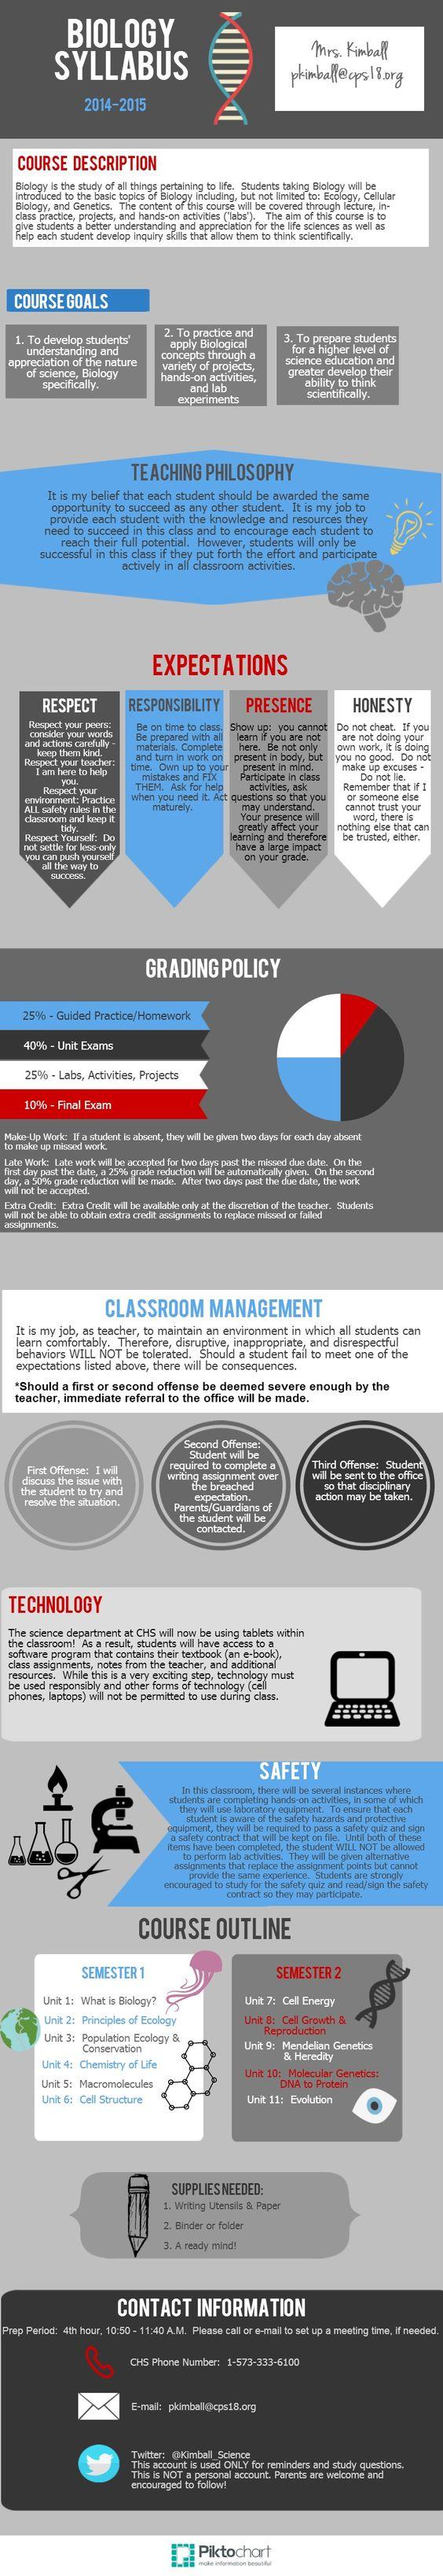 2014-2015 Biology Syllabus   Piktochart Infographic Editor